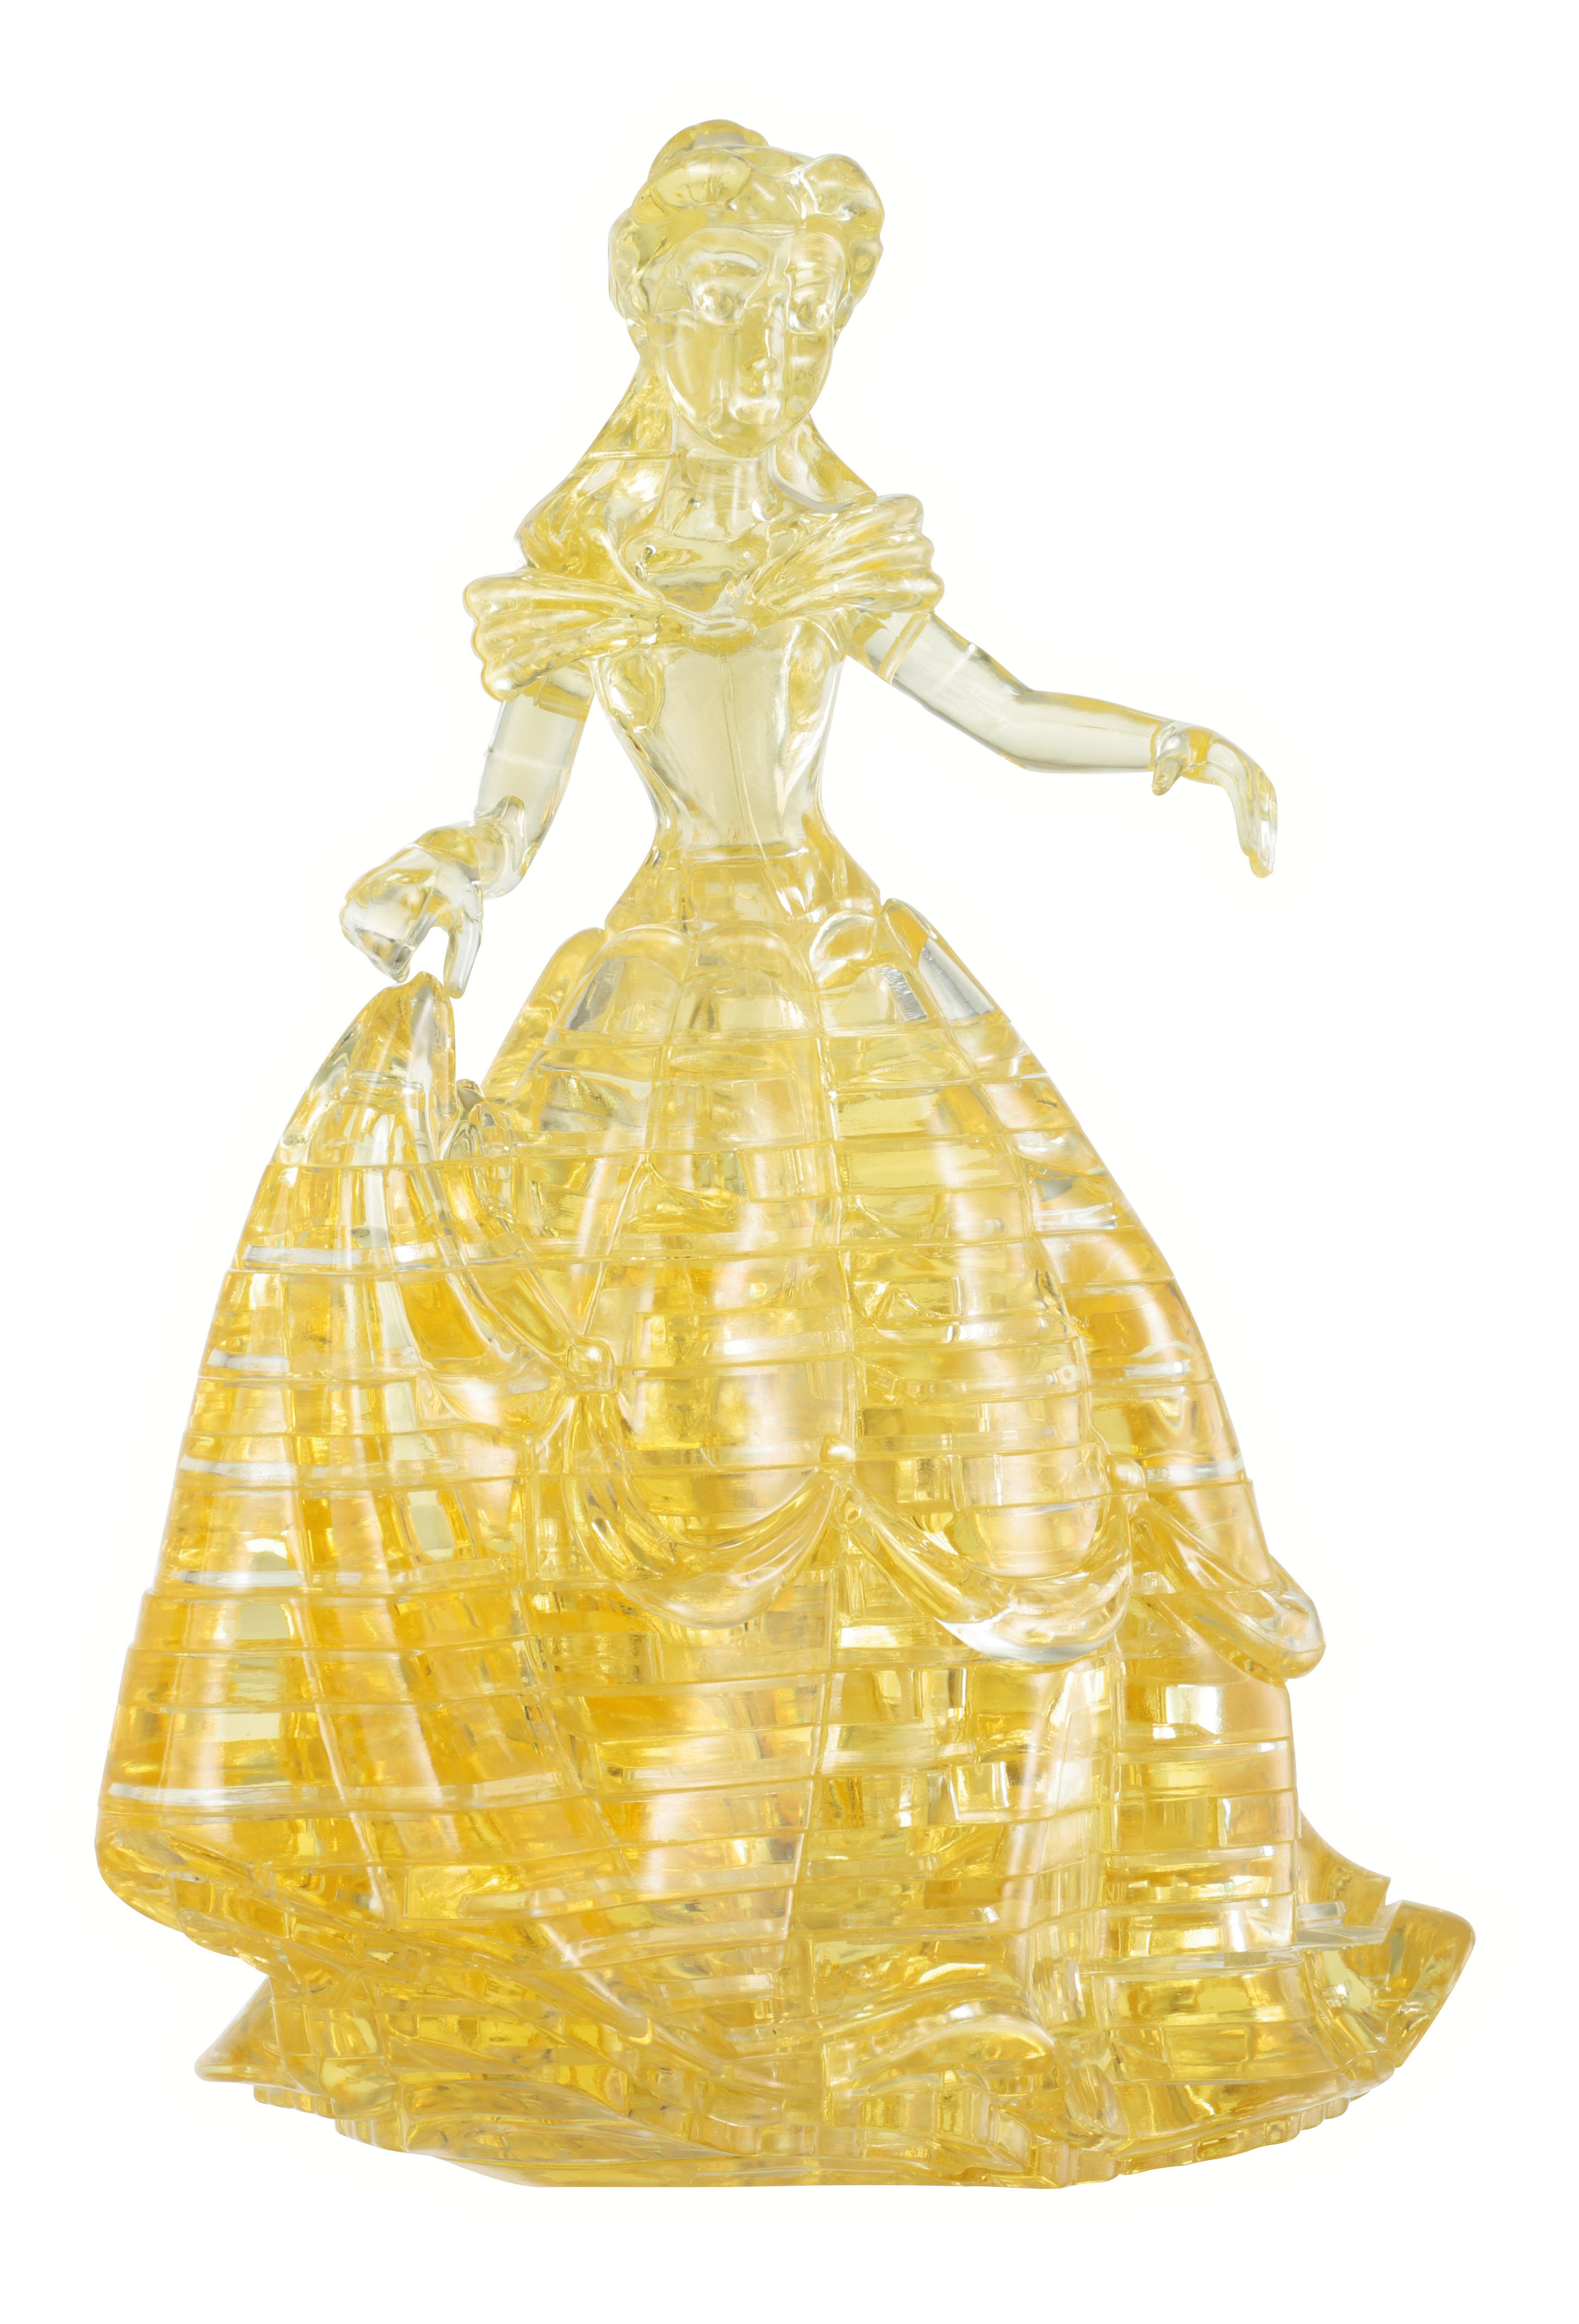 31028 Belle 3D Crystal Puzzle